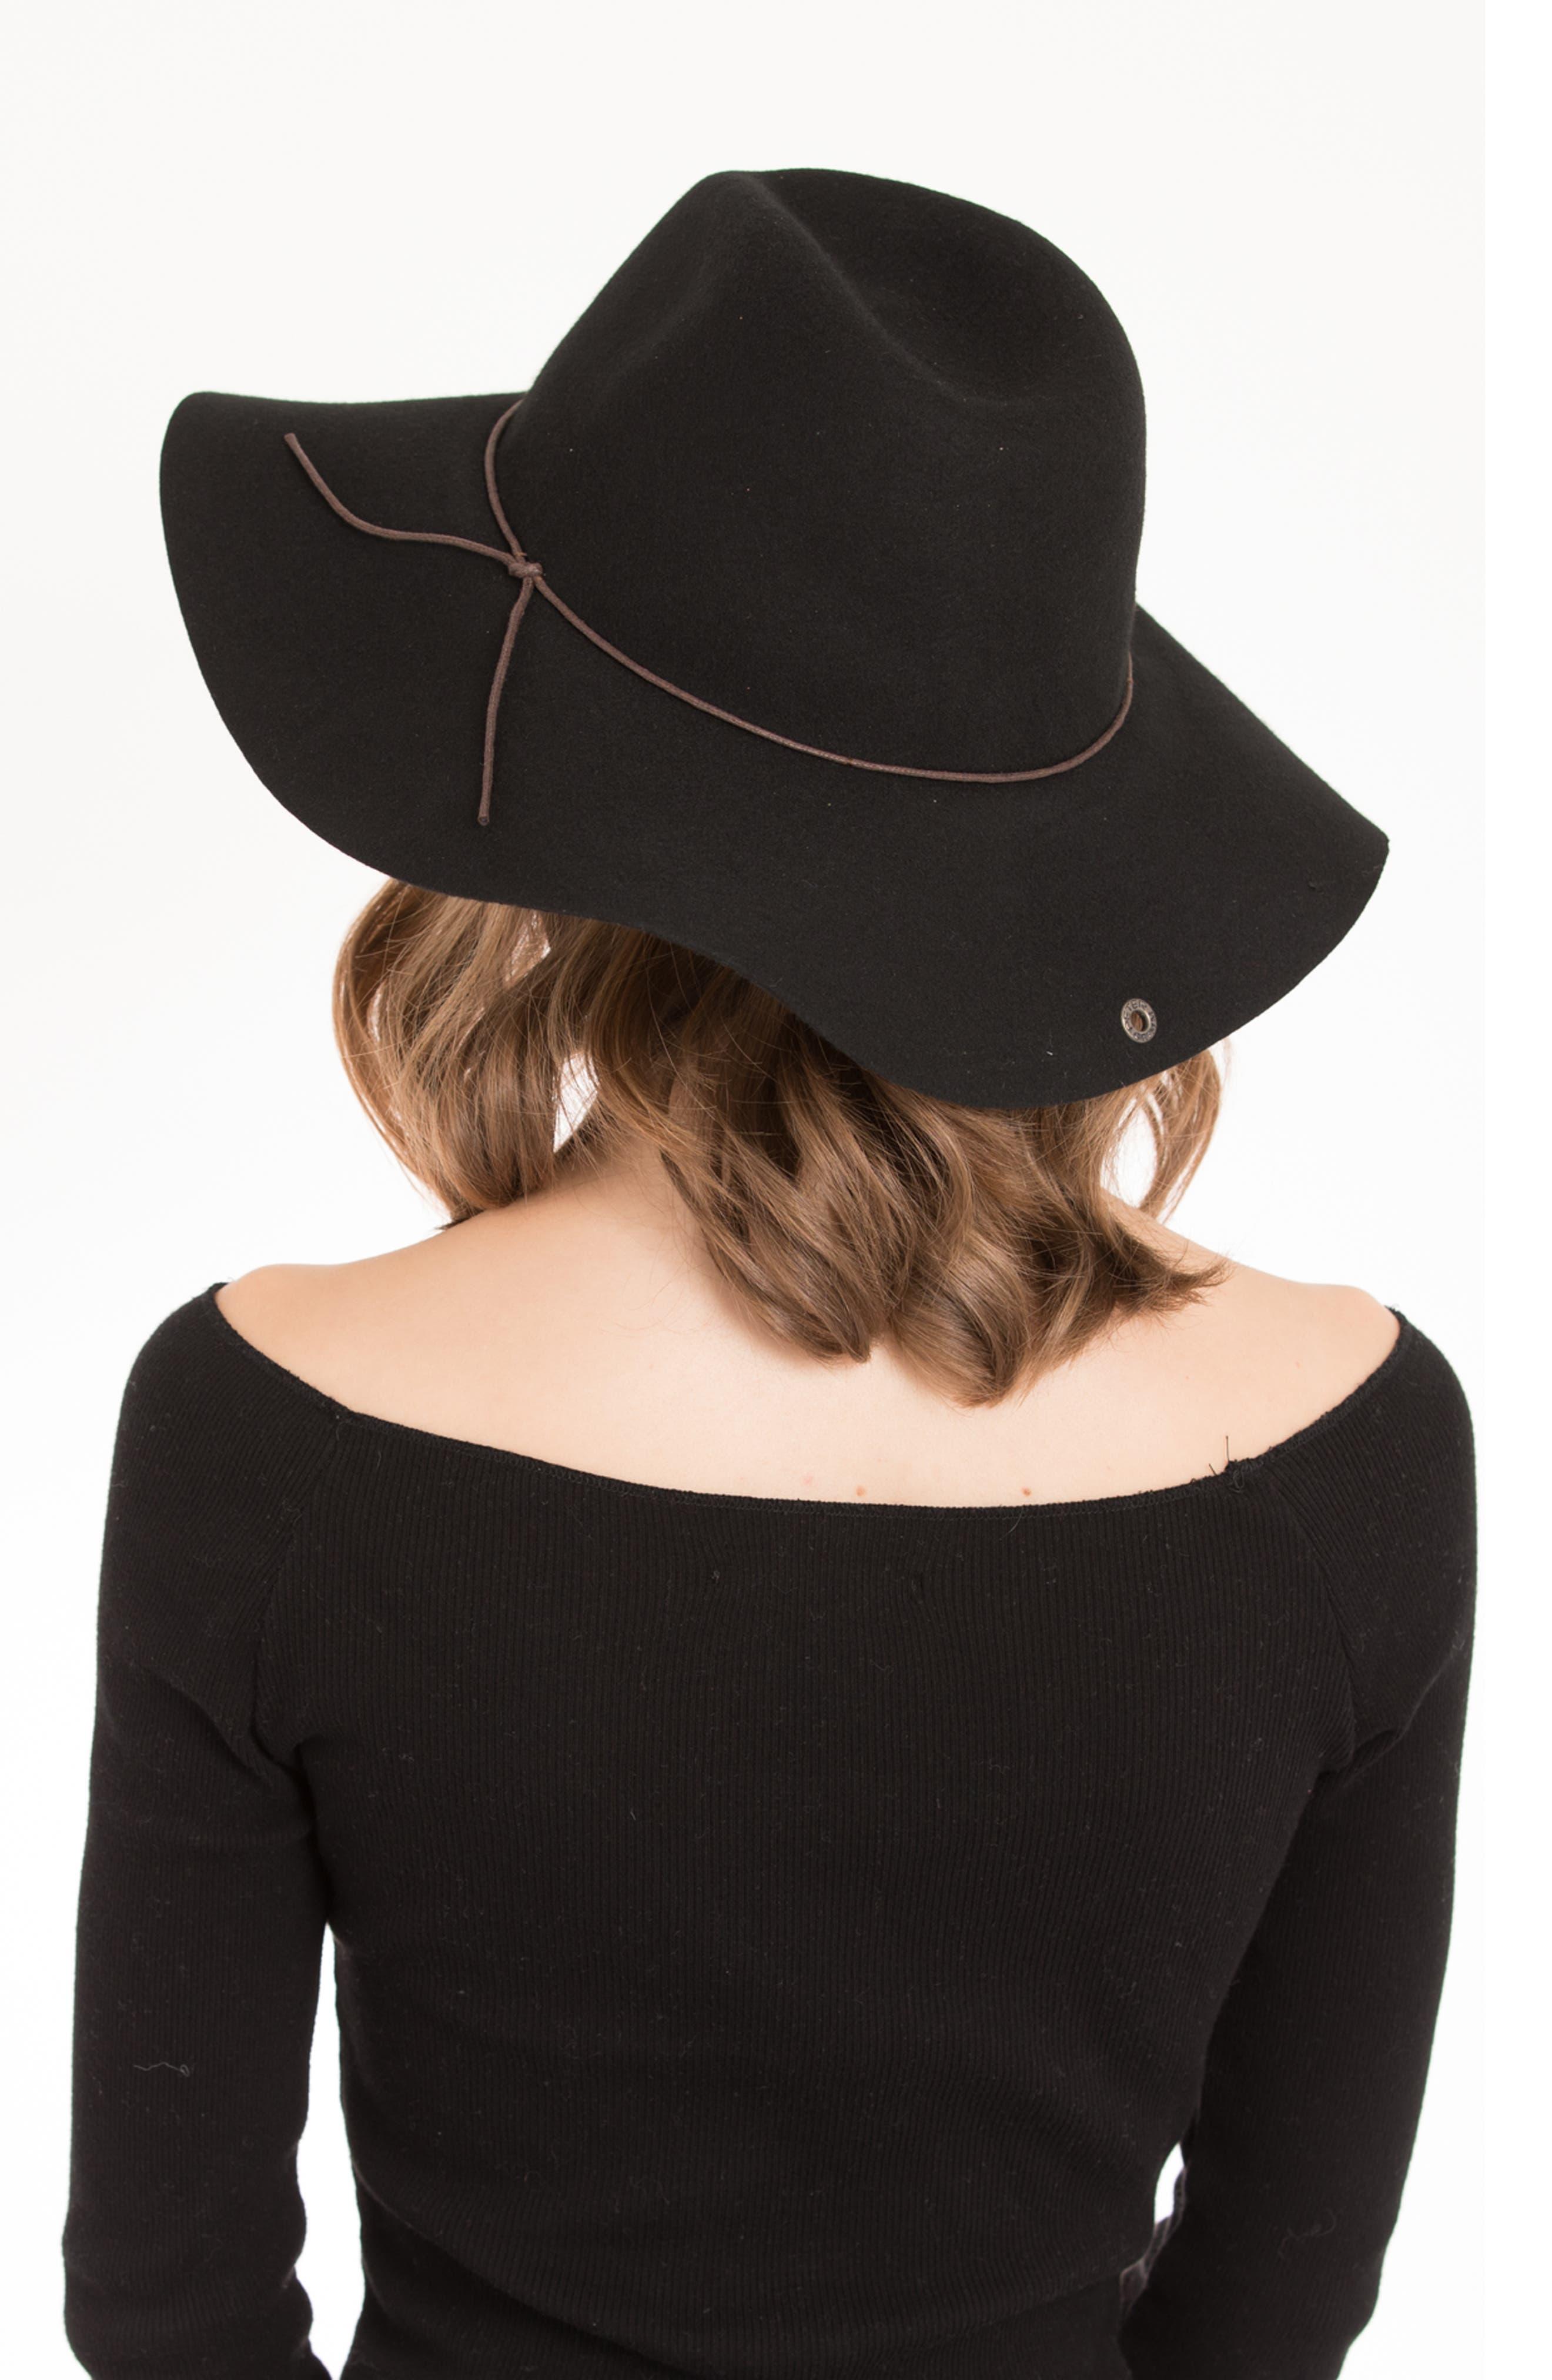 Zima Felted Wool Hat,                             Alternate thumbnail 4, color,                             BLACK